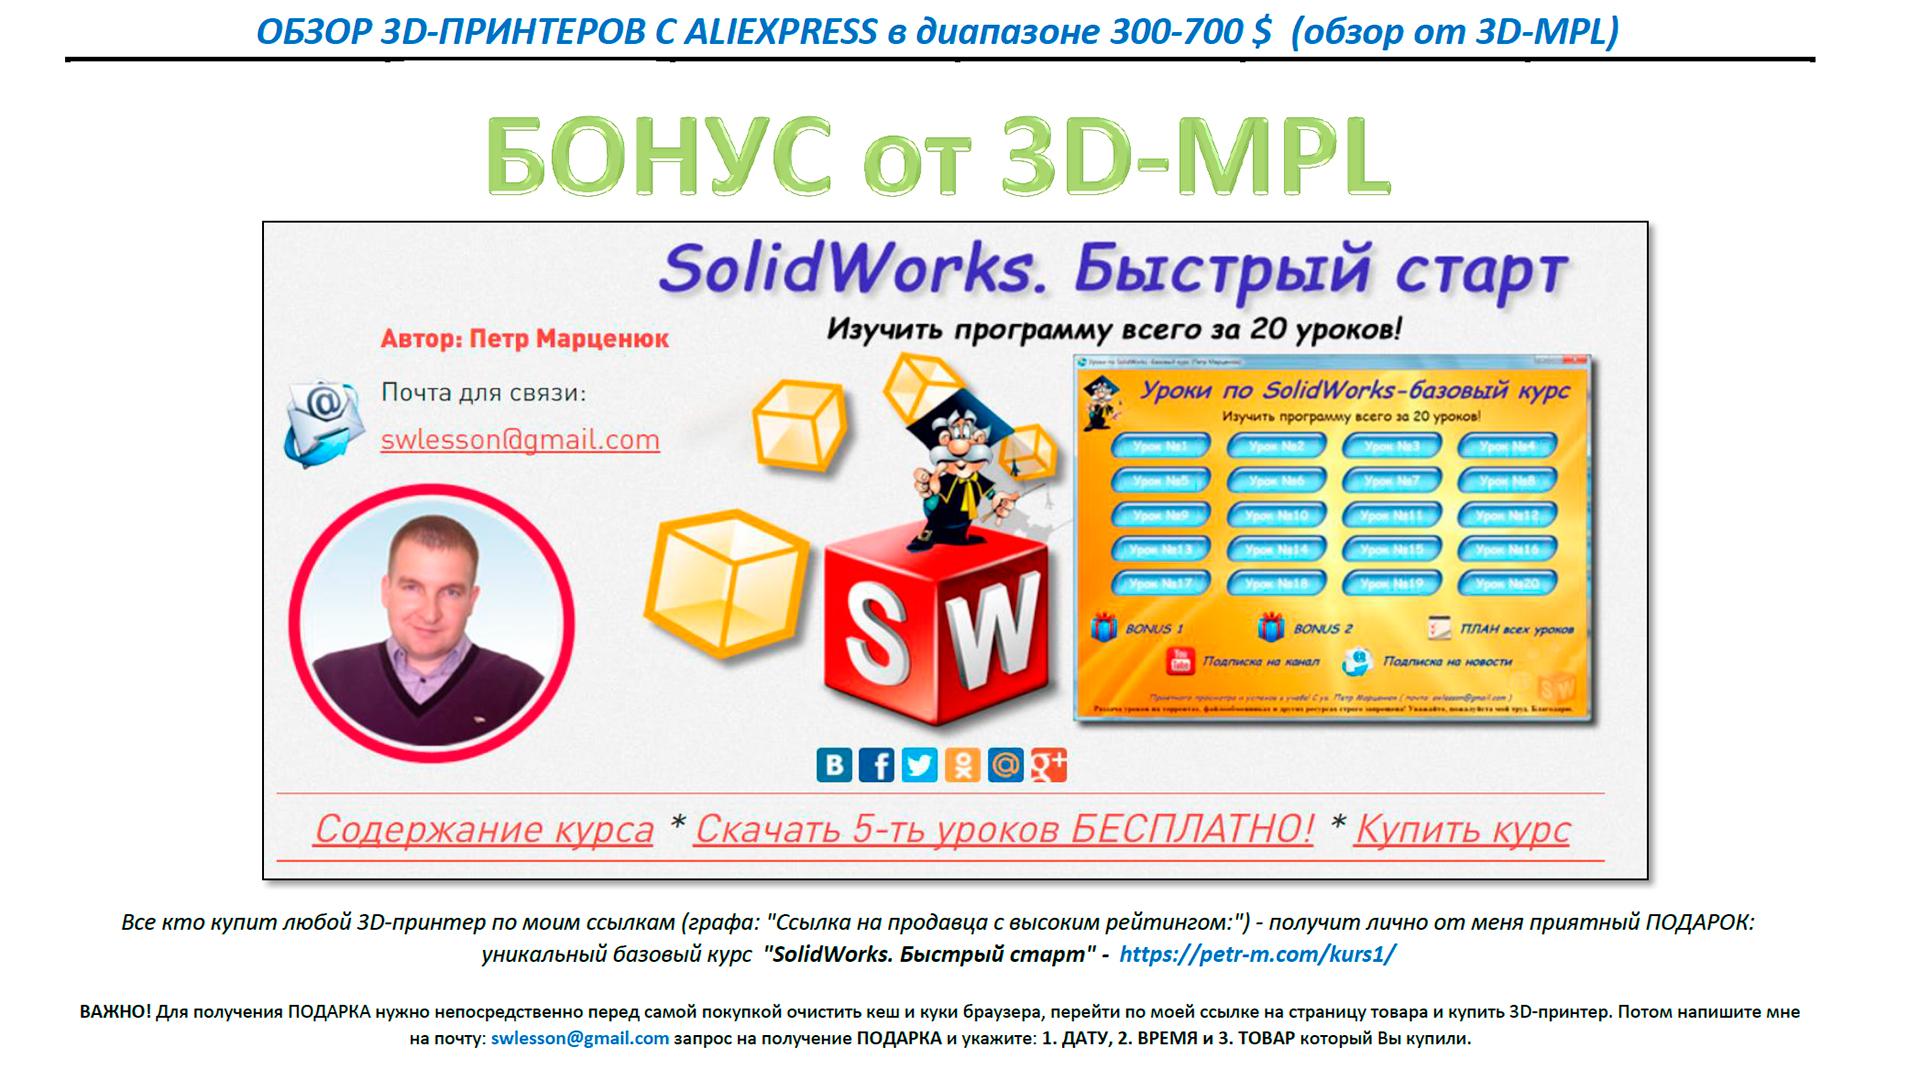 Бонус. Базовый курс по SolidWorks